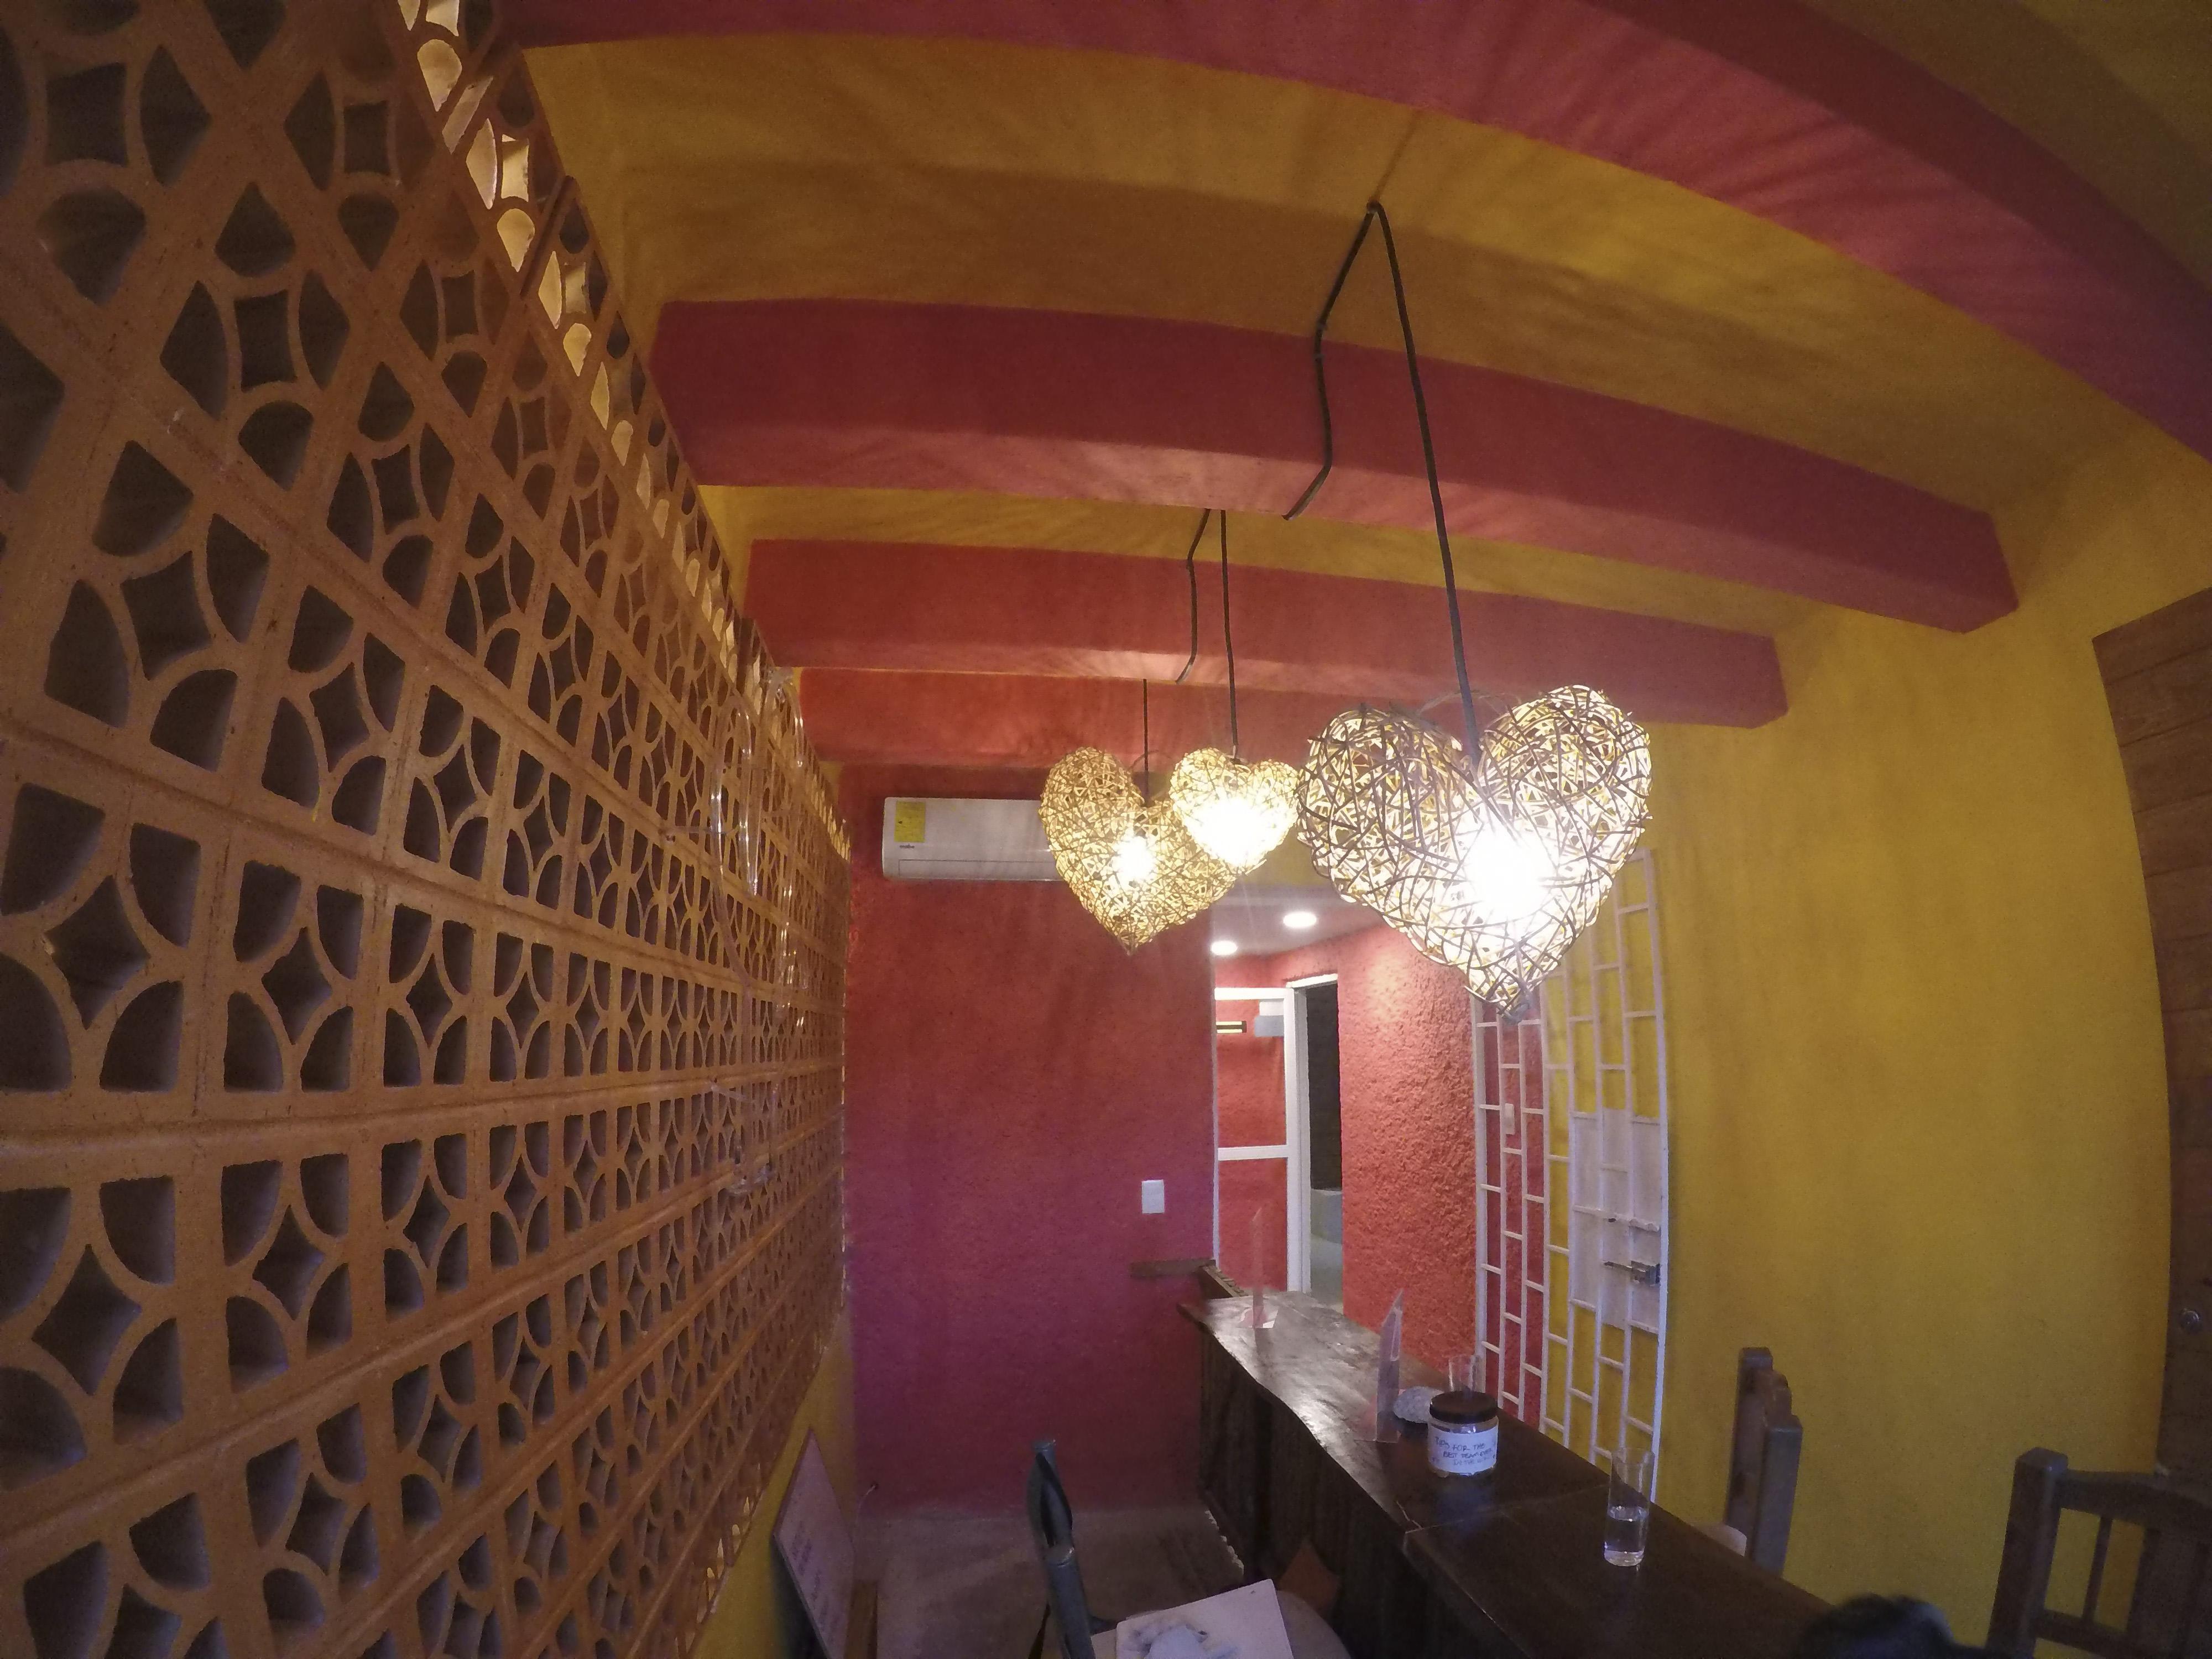 Hostalito Mexican Hostel